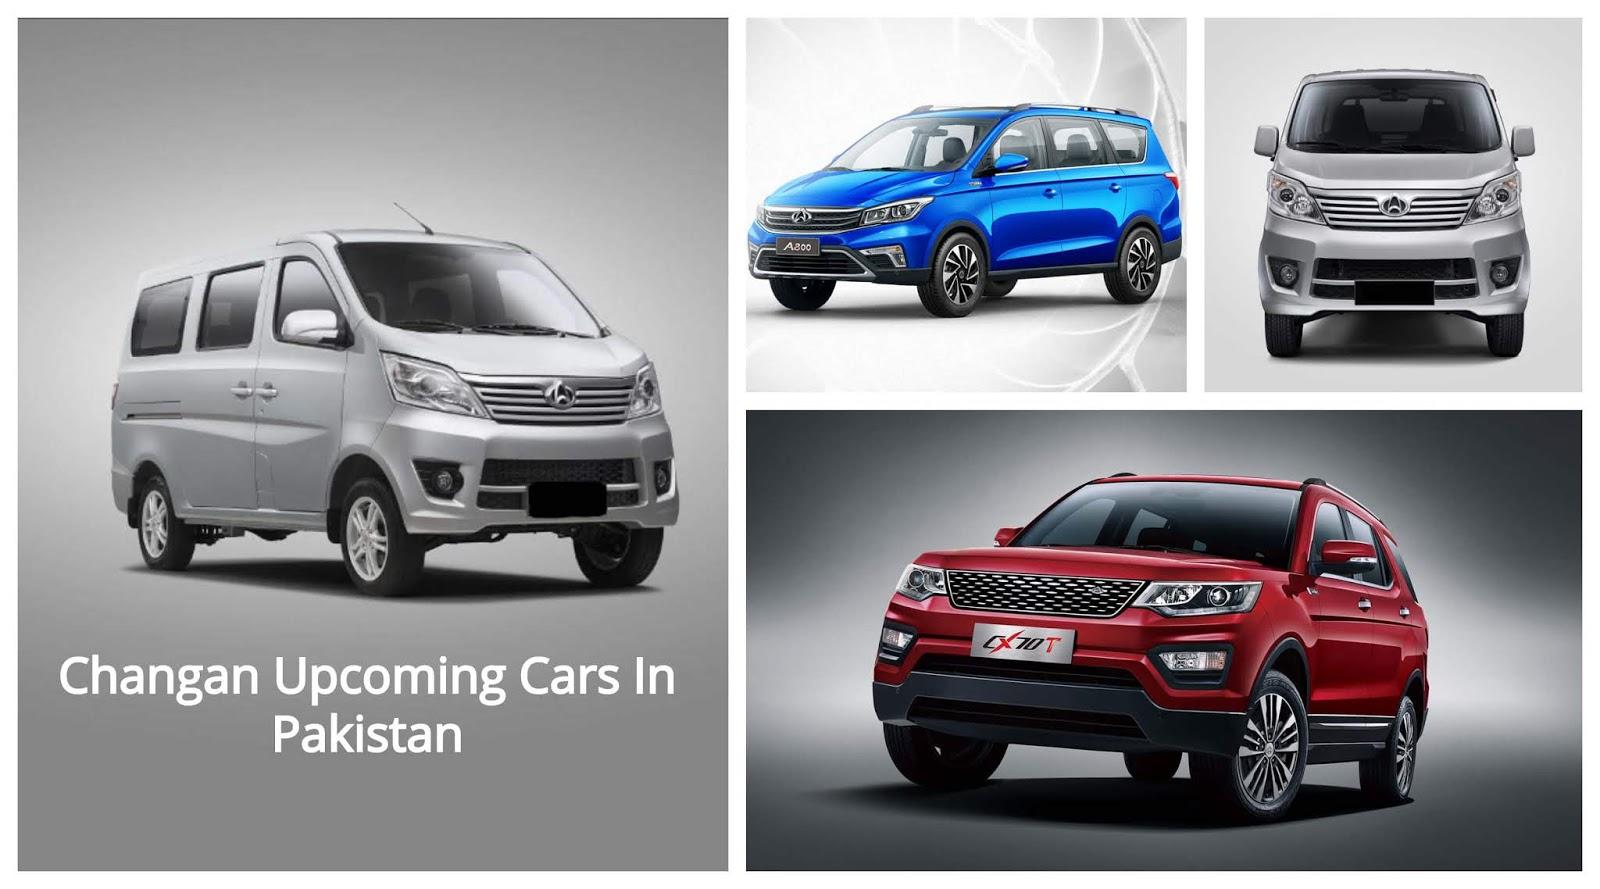 Changan Upcoming Cars In Pakistan